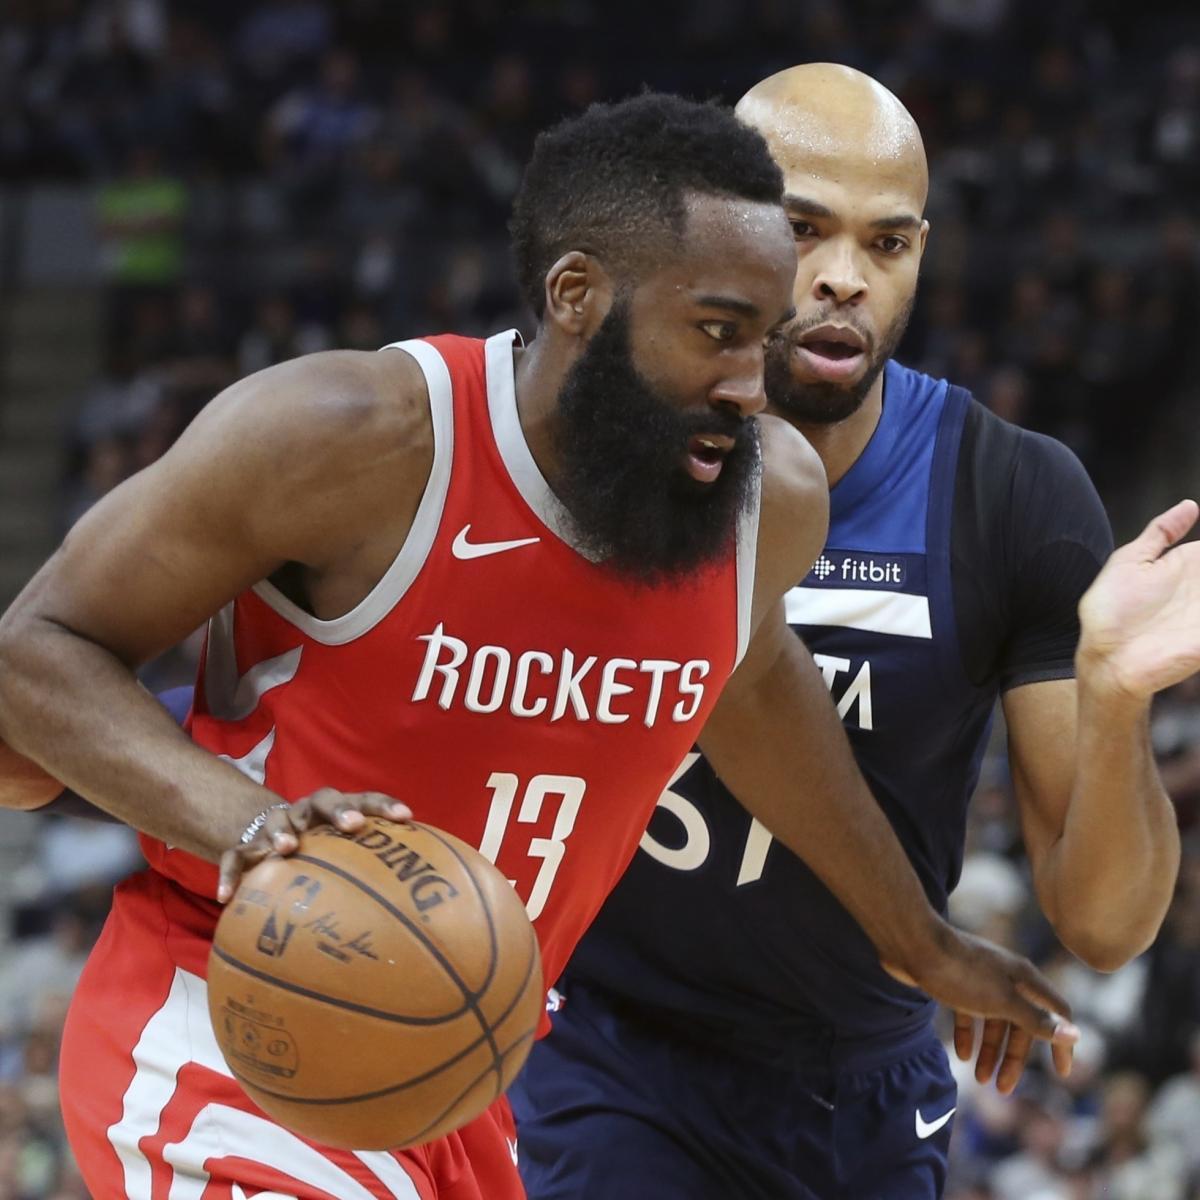 Houston Rockets Upcoming Home Games: Houston Rockets Vs. Minnesota Timberwolves Game 4 Odds